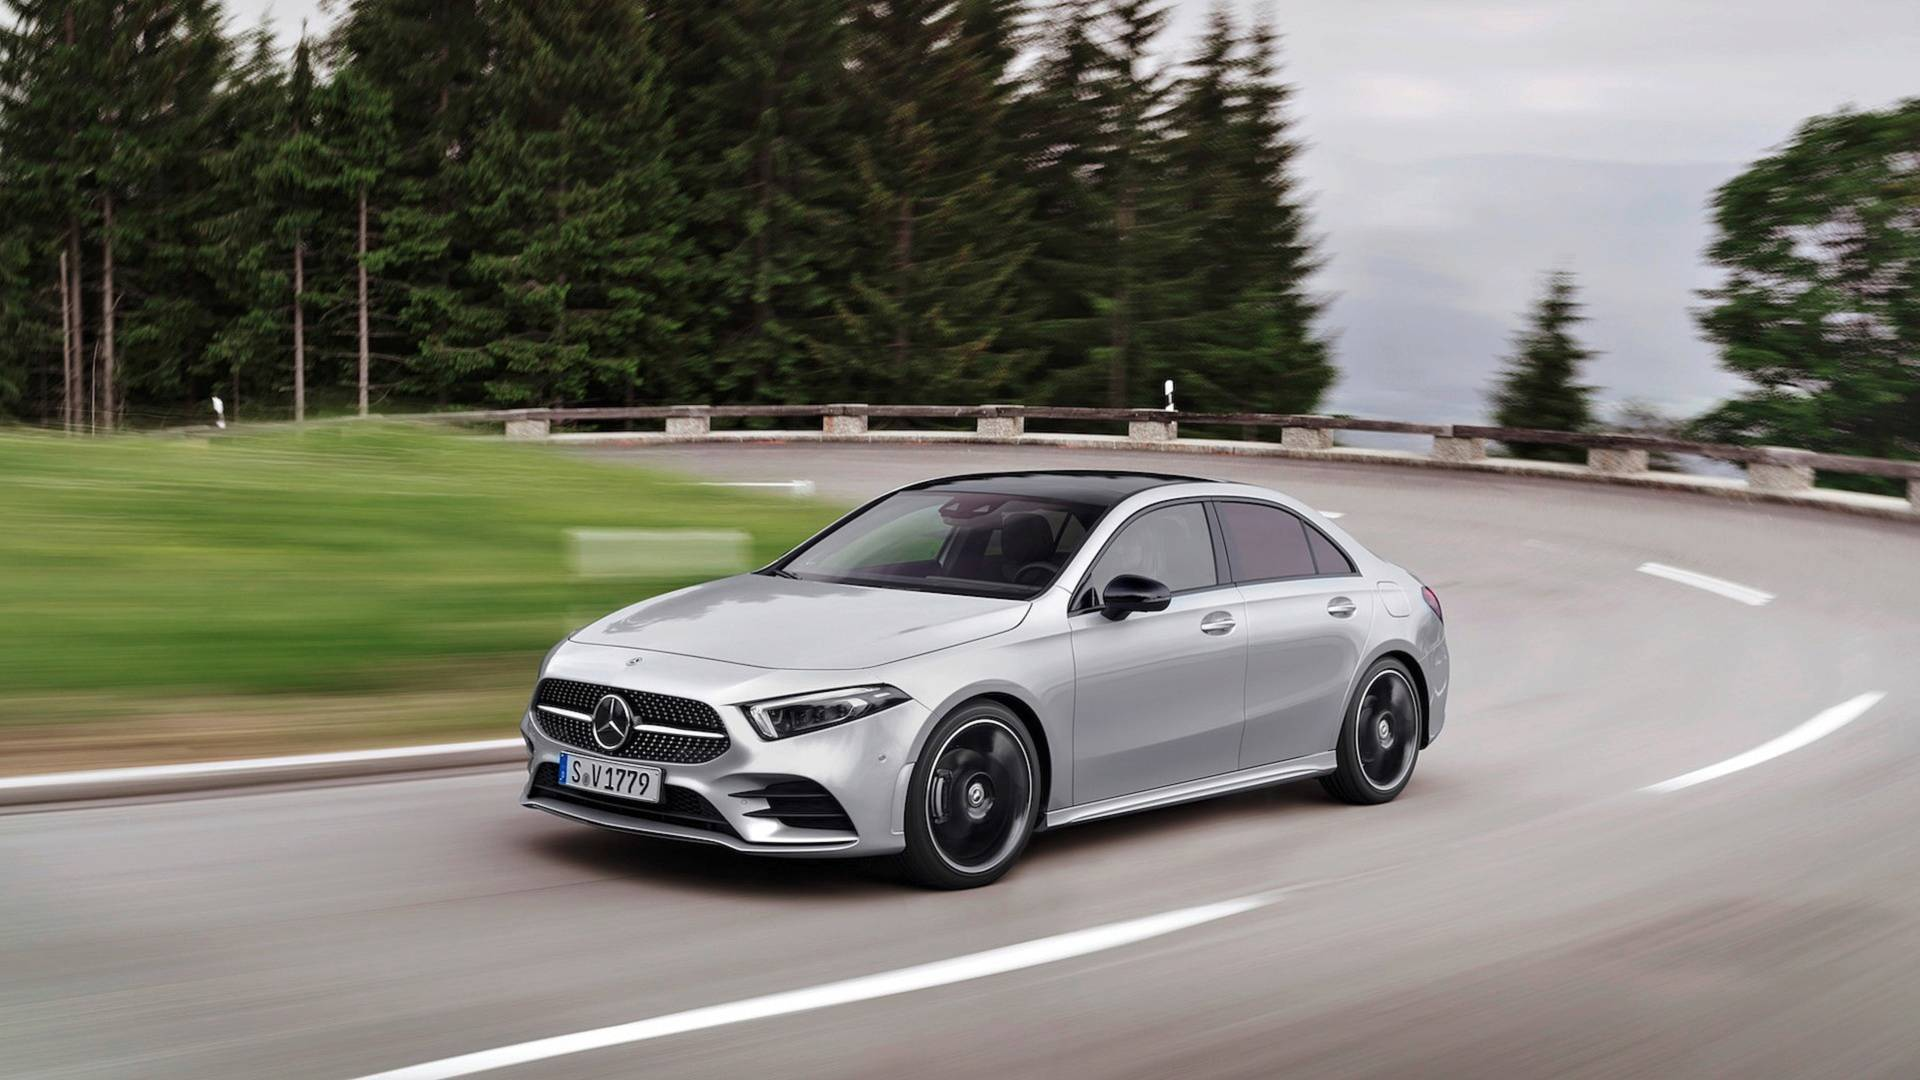 Mercedes-Benz A klase sedan startovao sa prodajom u Evropi (GALERIJA)